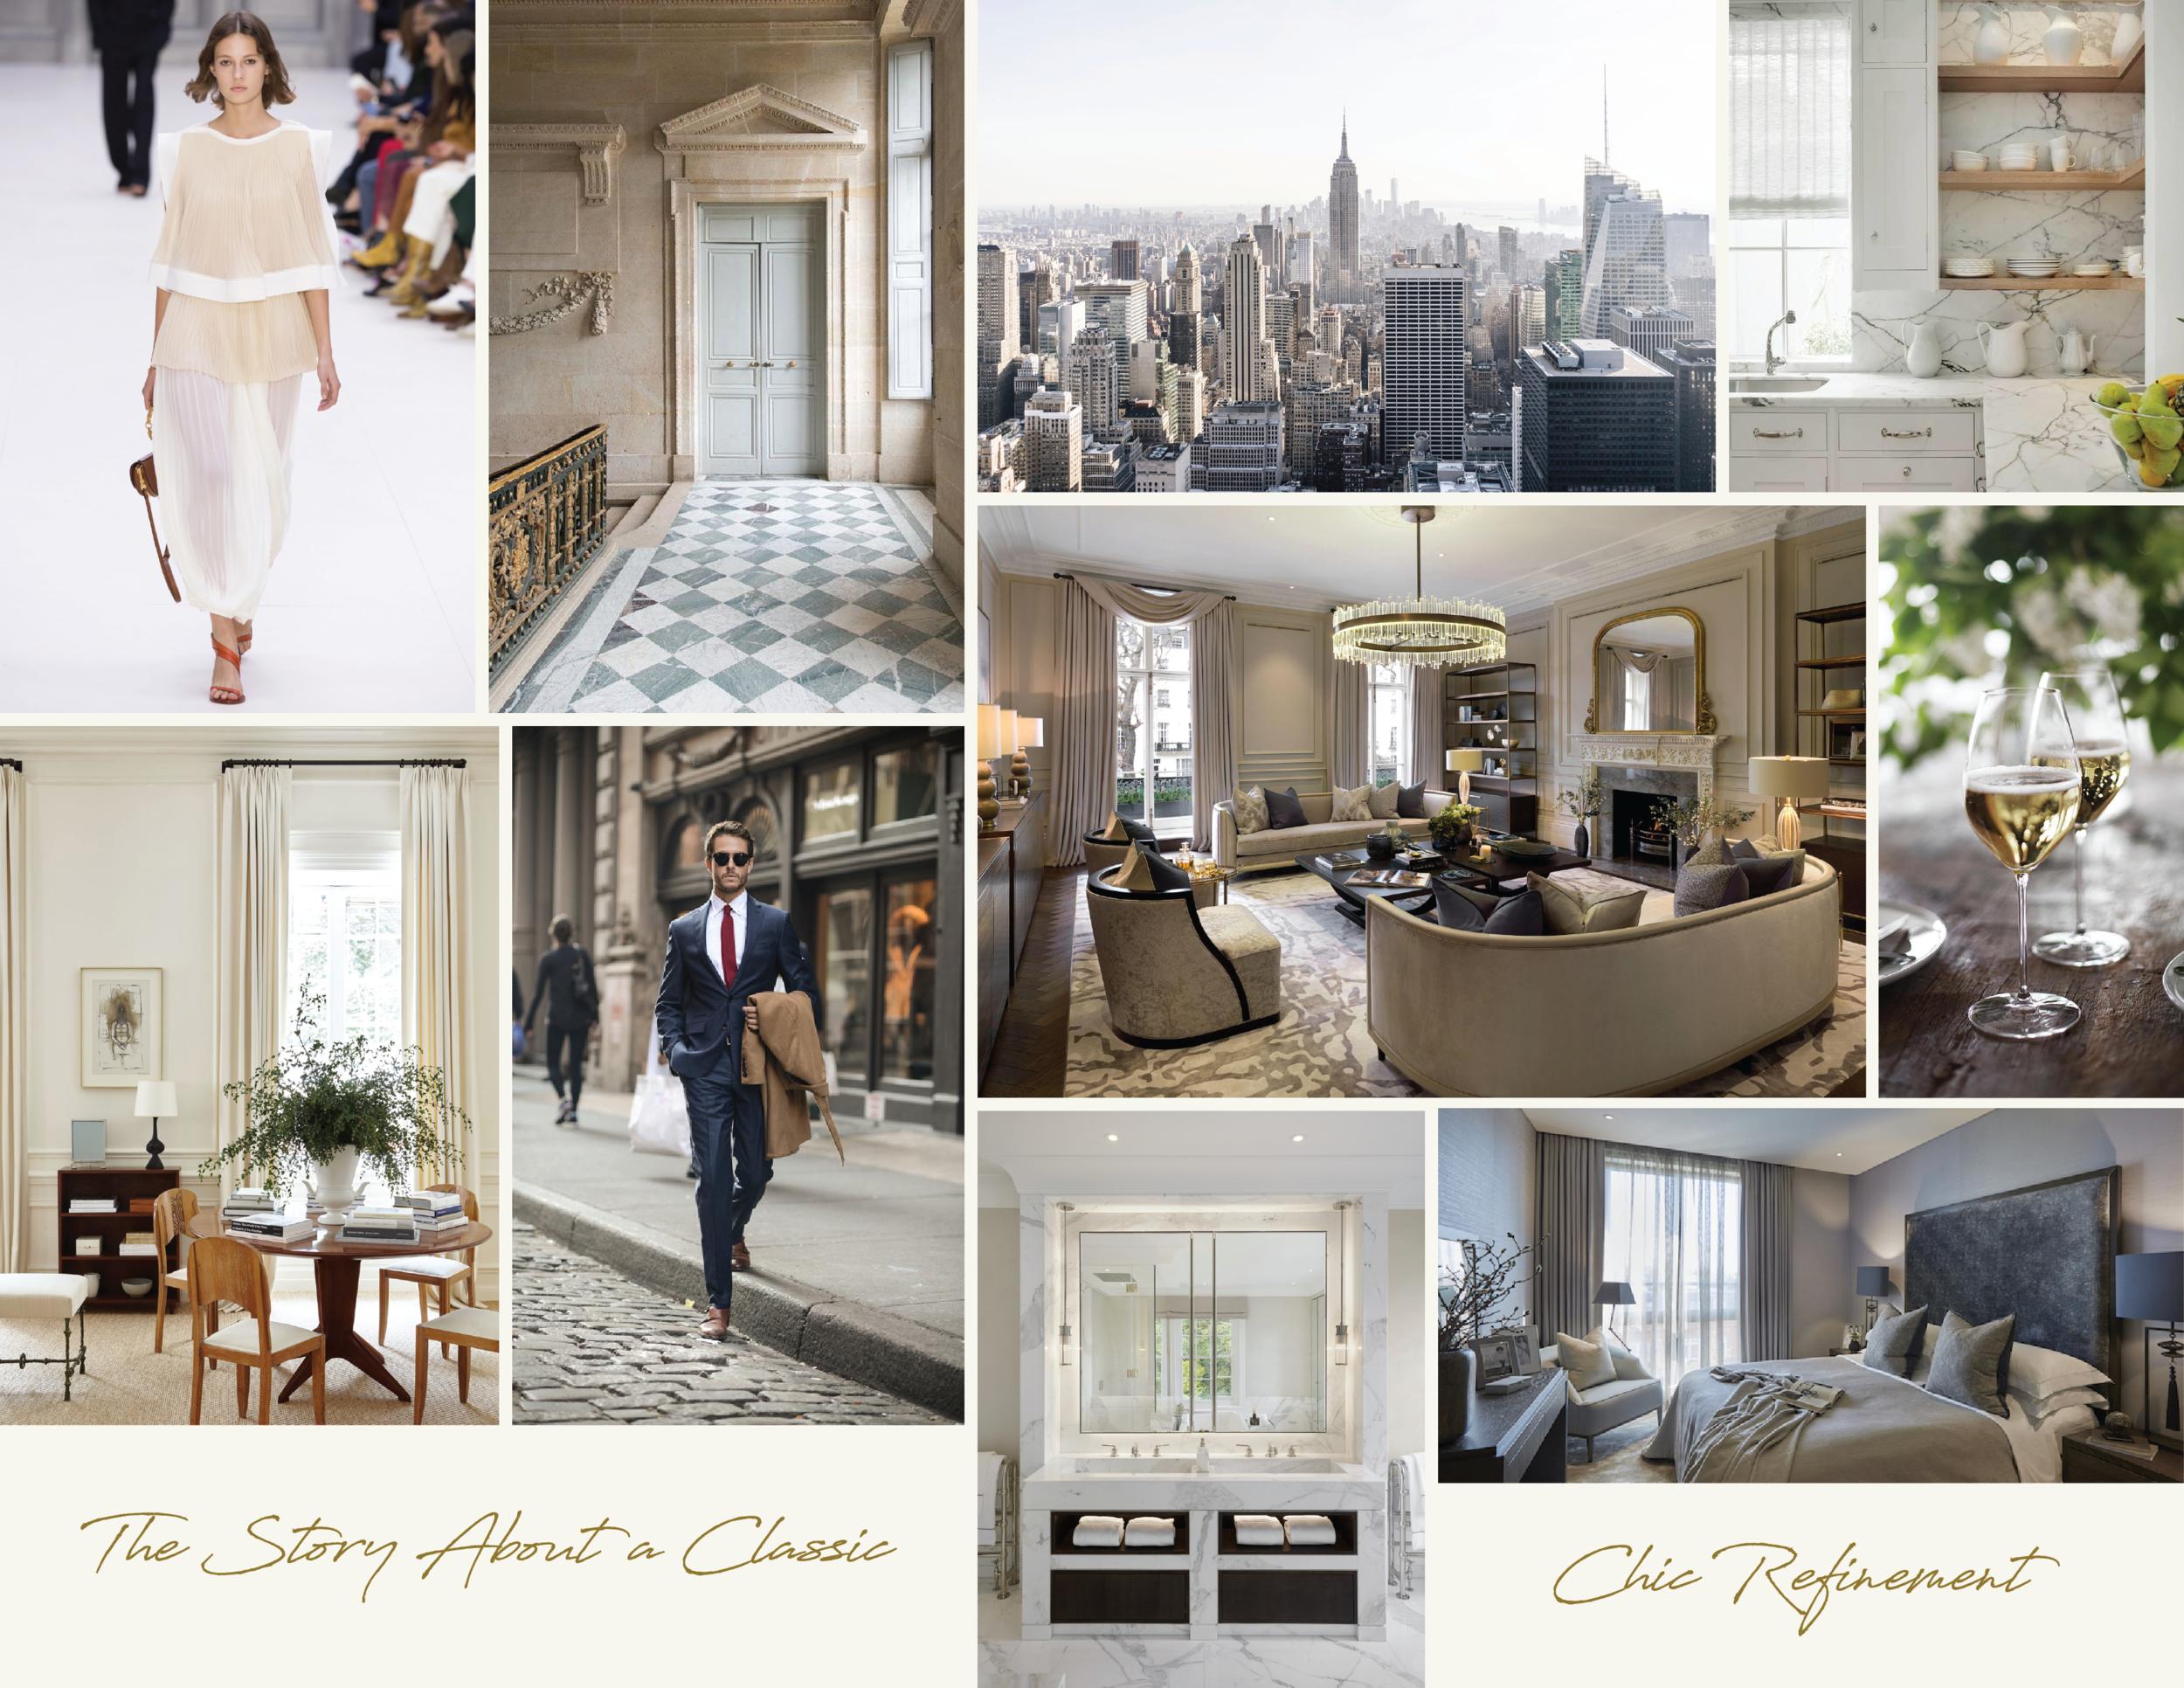 Synonymous | Luxury Interior Design Studio NYC  Company Signature Aesthetic Mood Board — Synonymouss.com